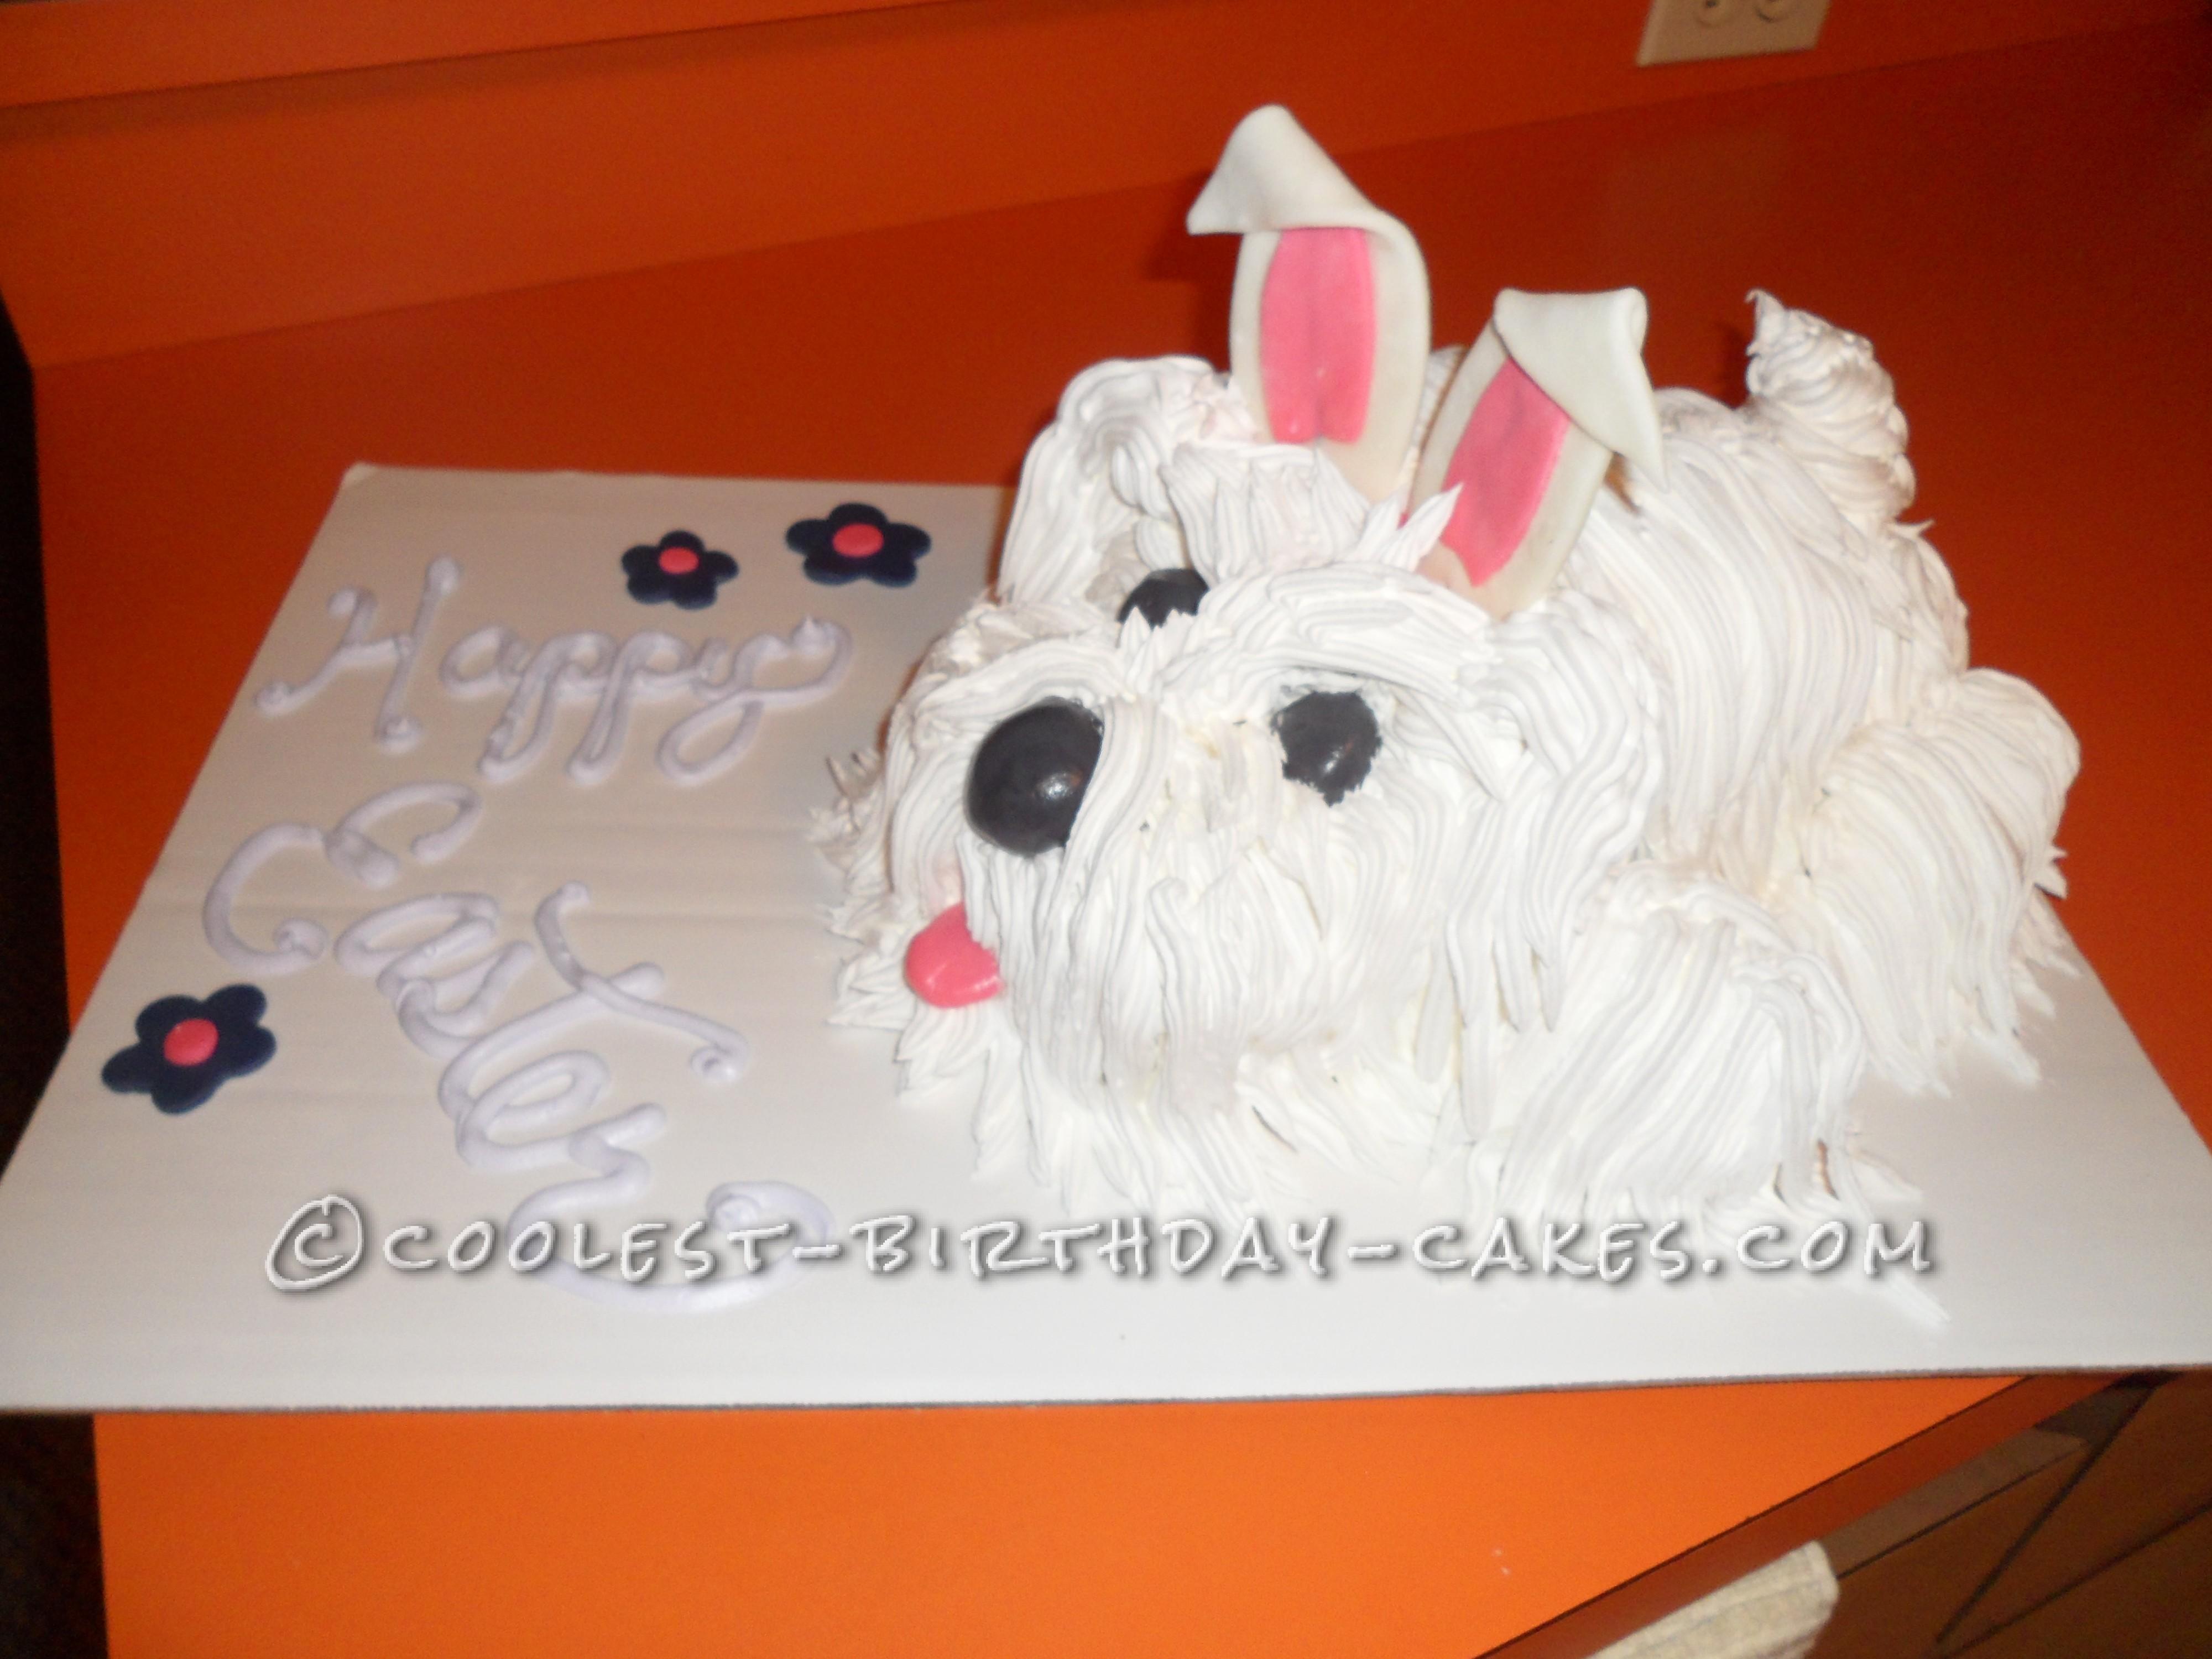 Cool Homemade Dog Cake With Bunny Ears